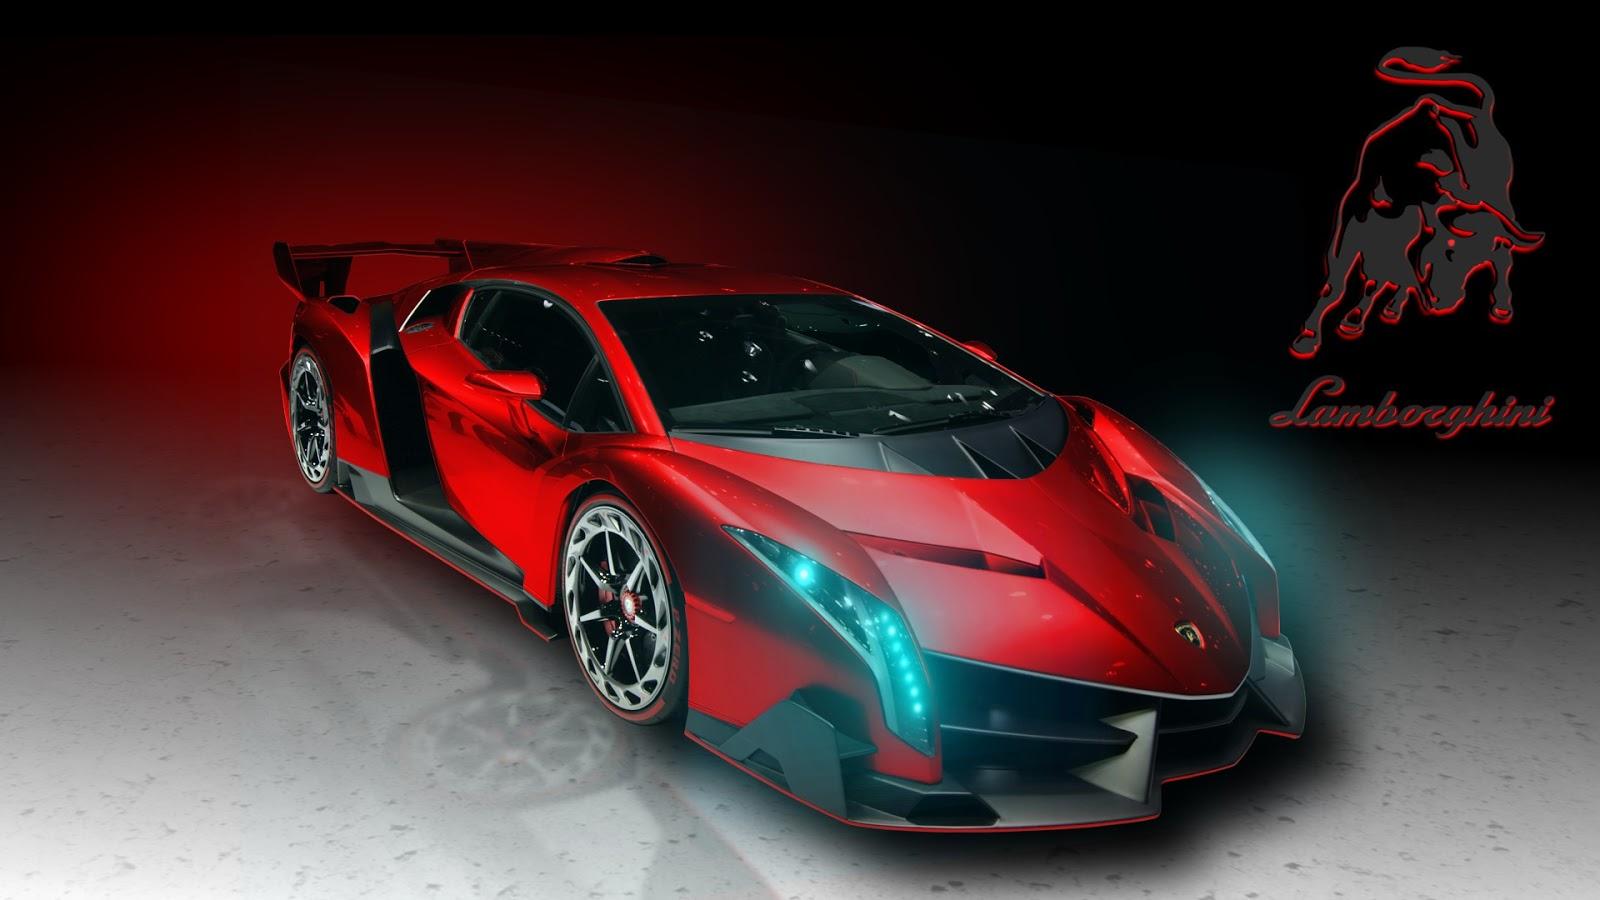 Daily Amazing Fun Car Wallpapers Lamborghini In Red